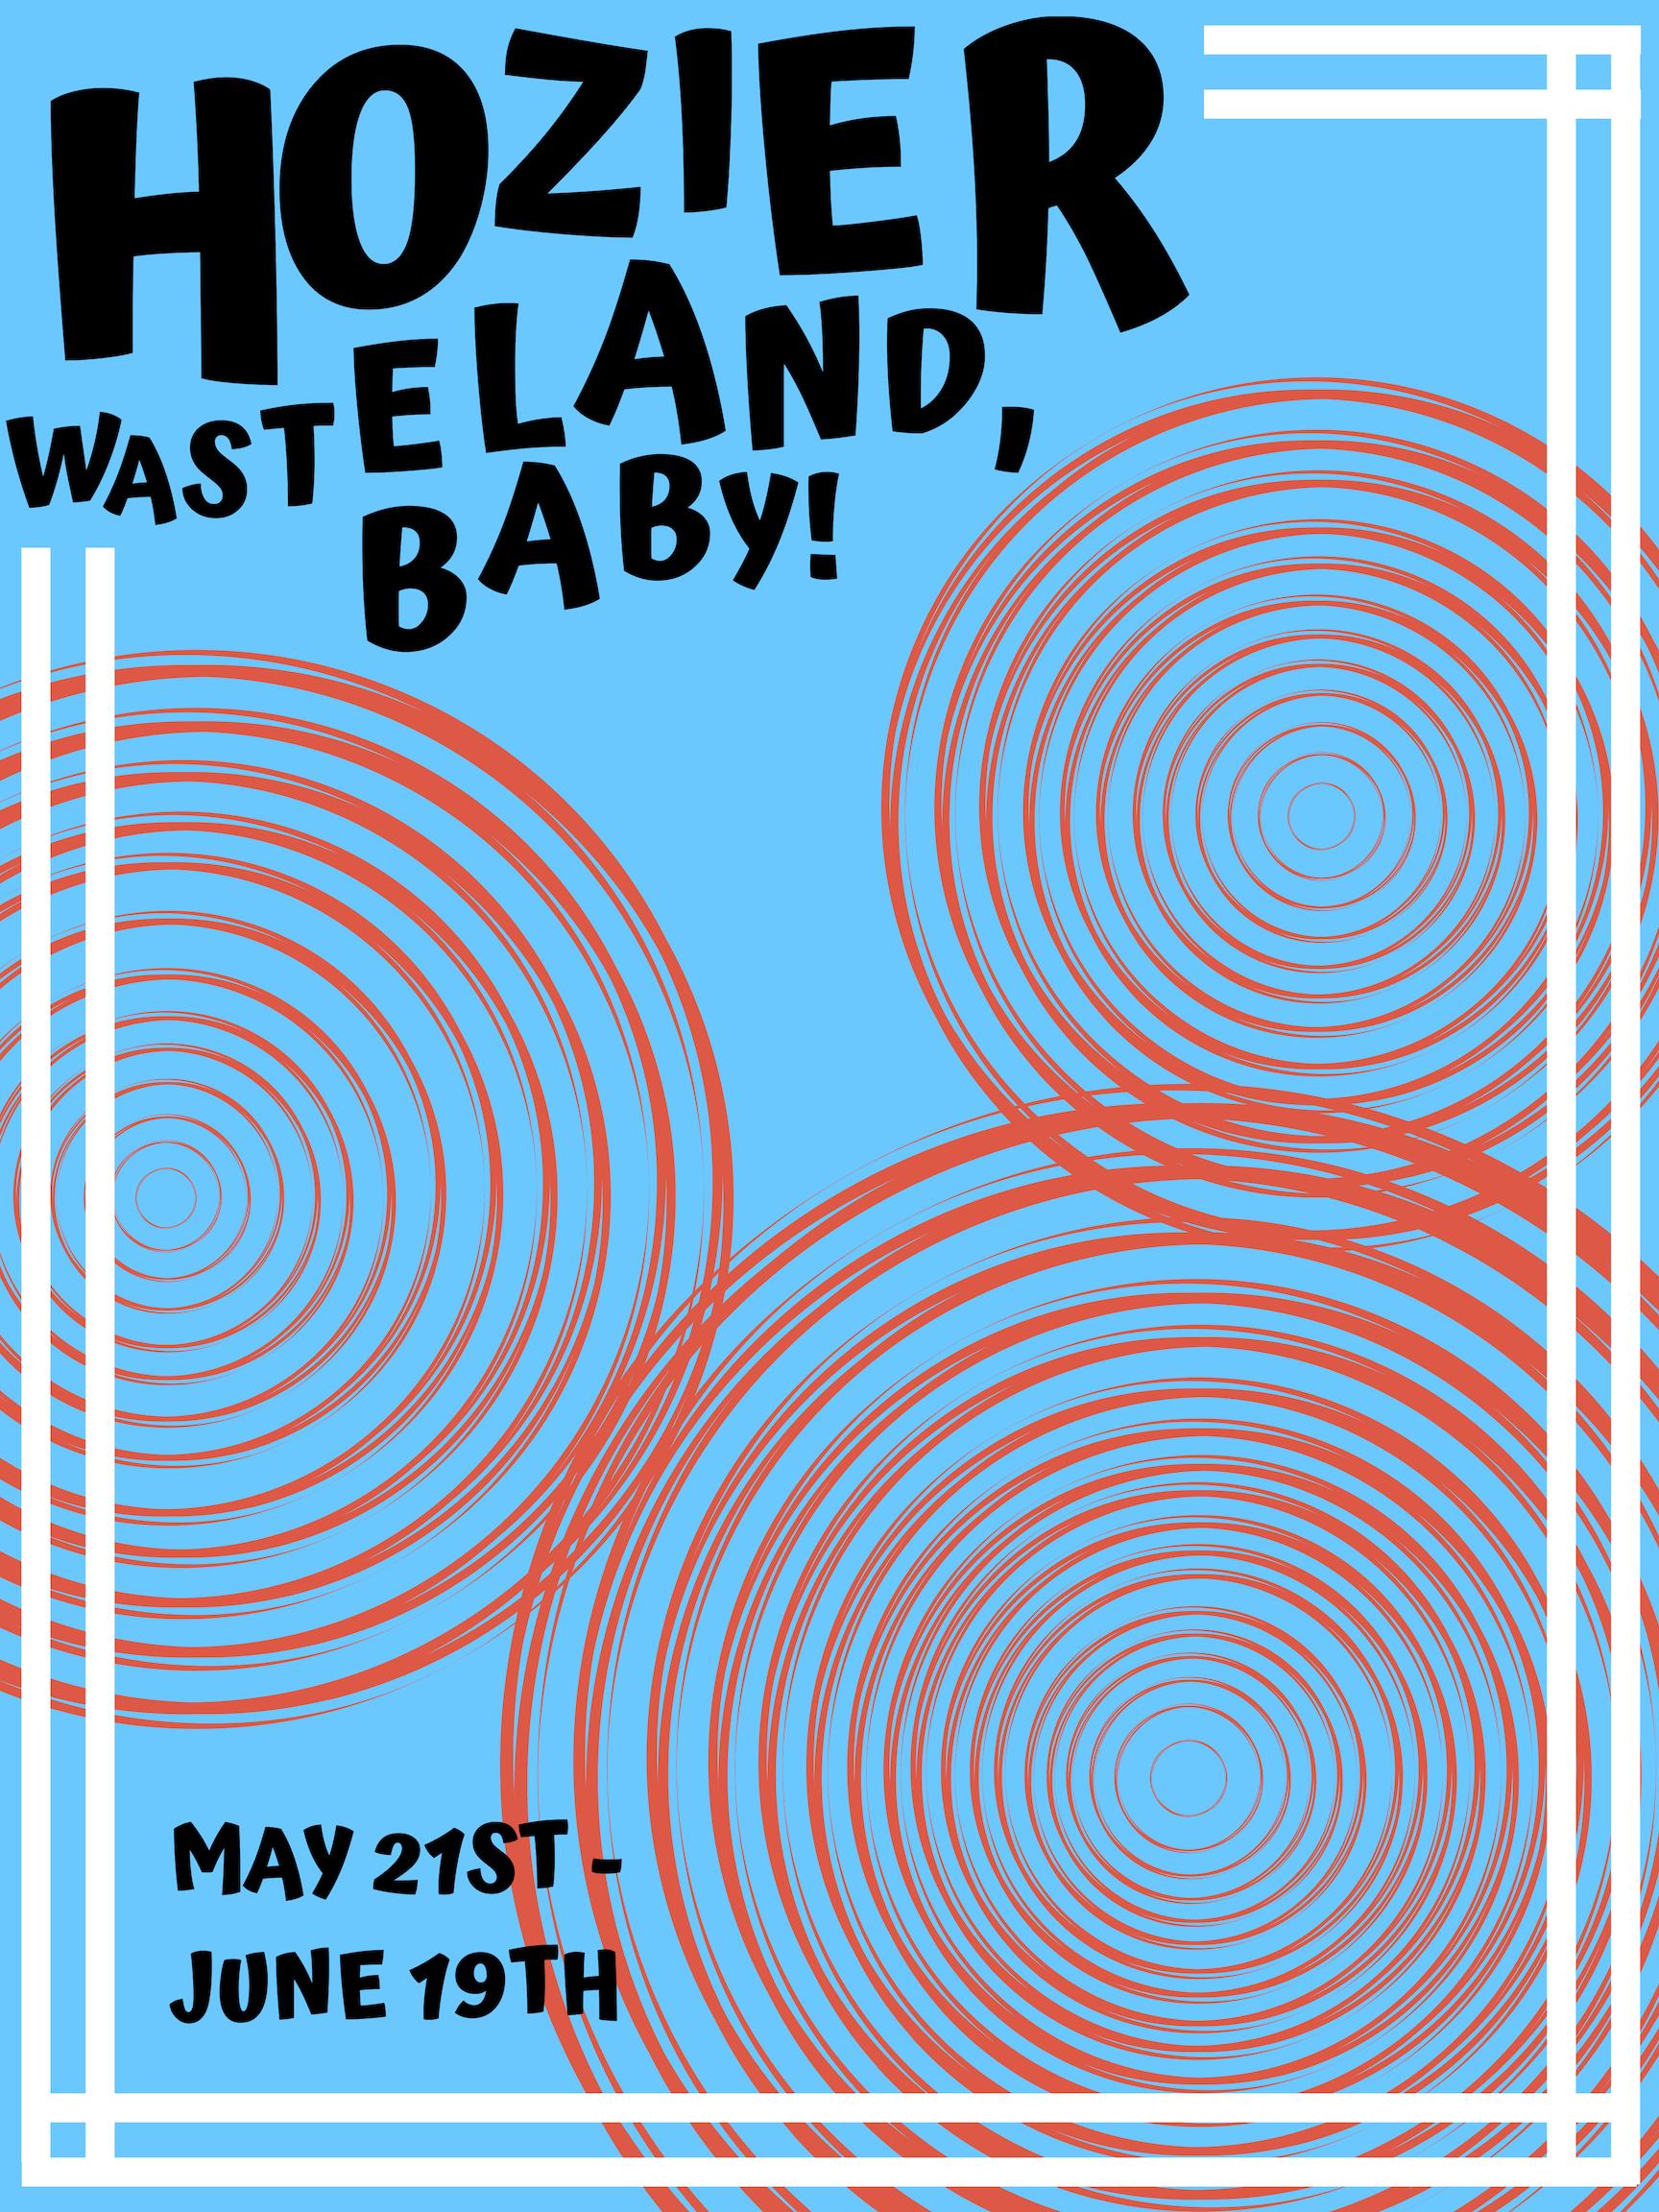 wasteland, BAby! Tour 2019.png